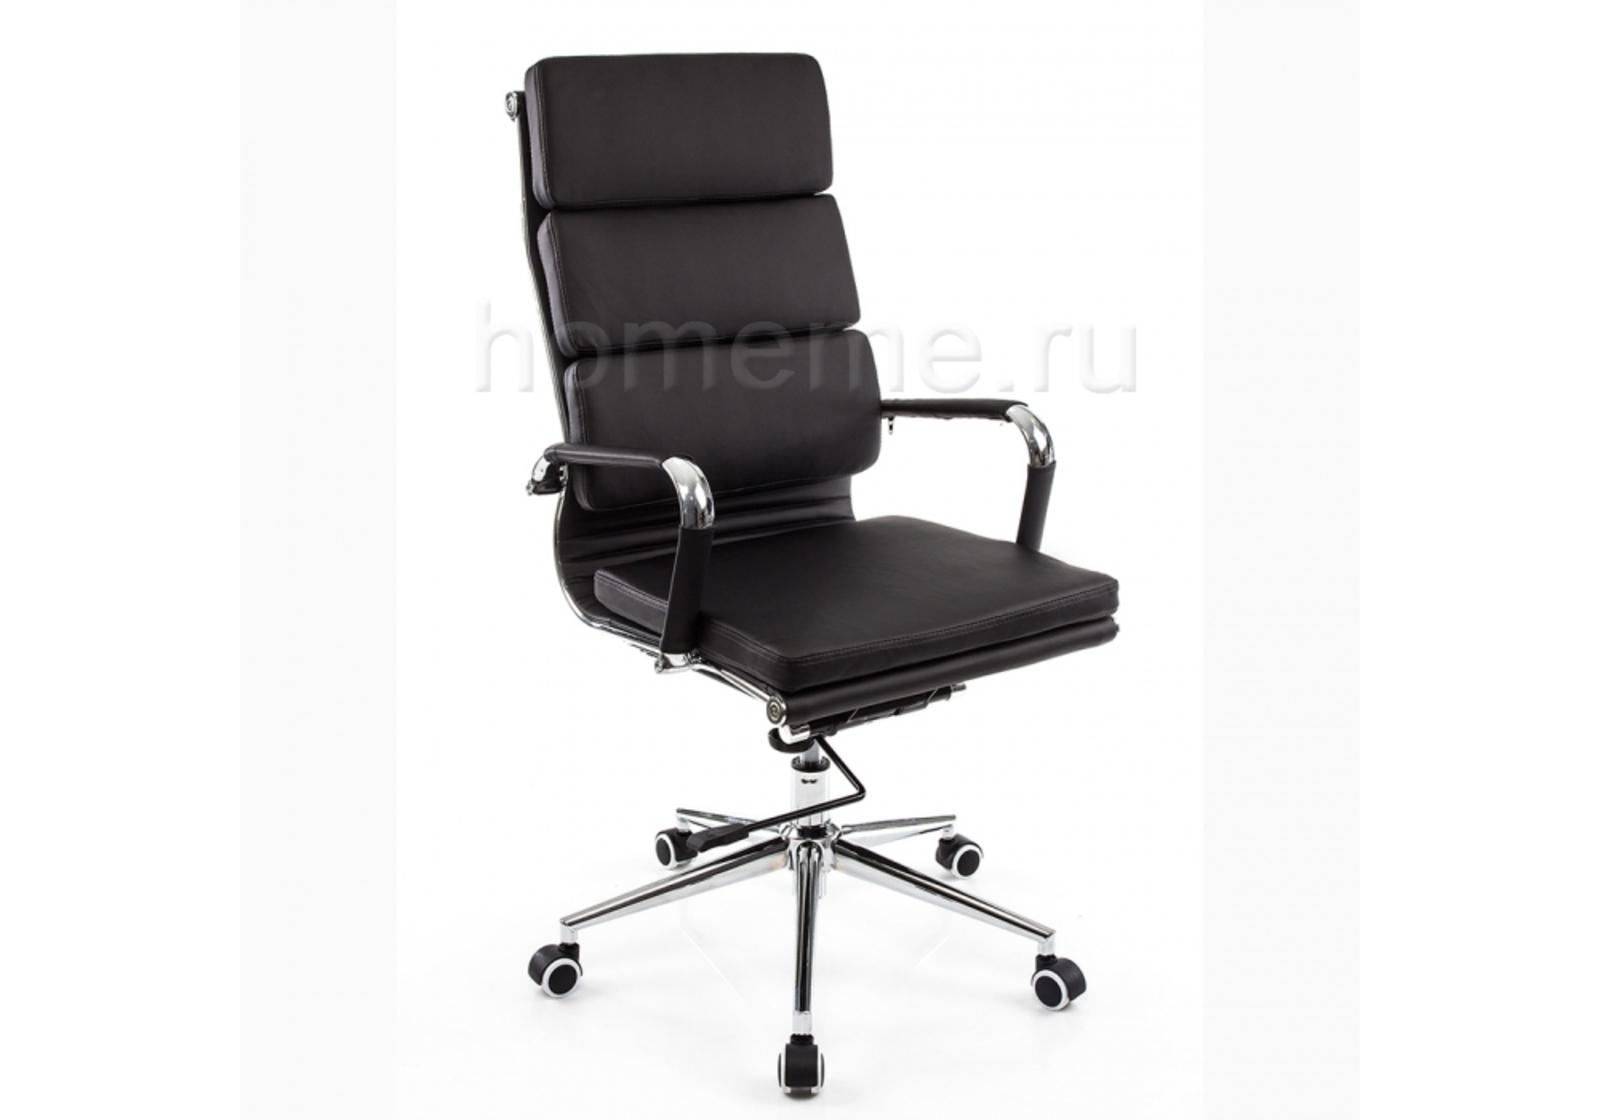 Кресло для офиса HomeMe Samora черное 1716 от Homeme.ru